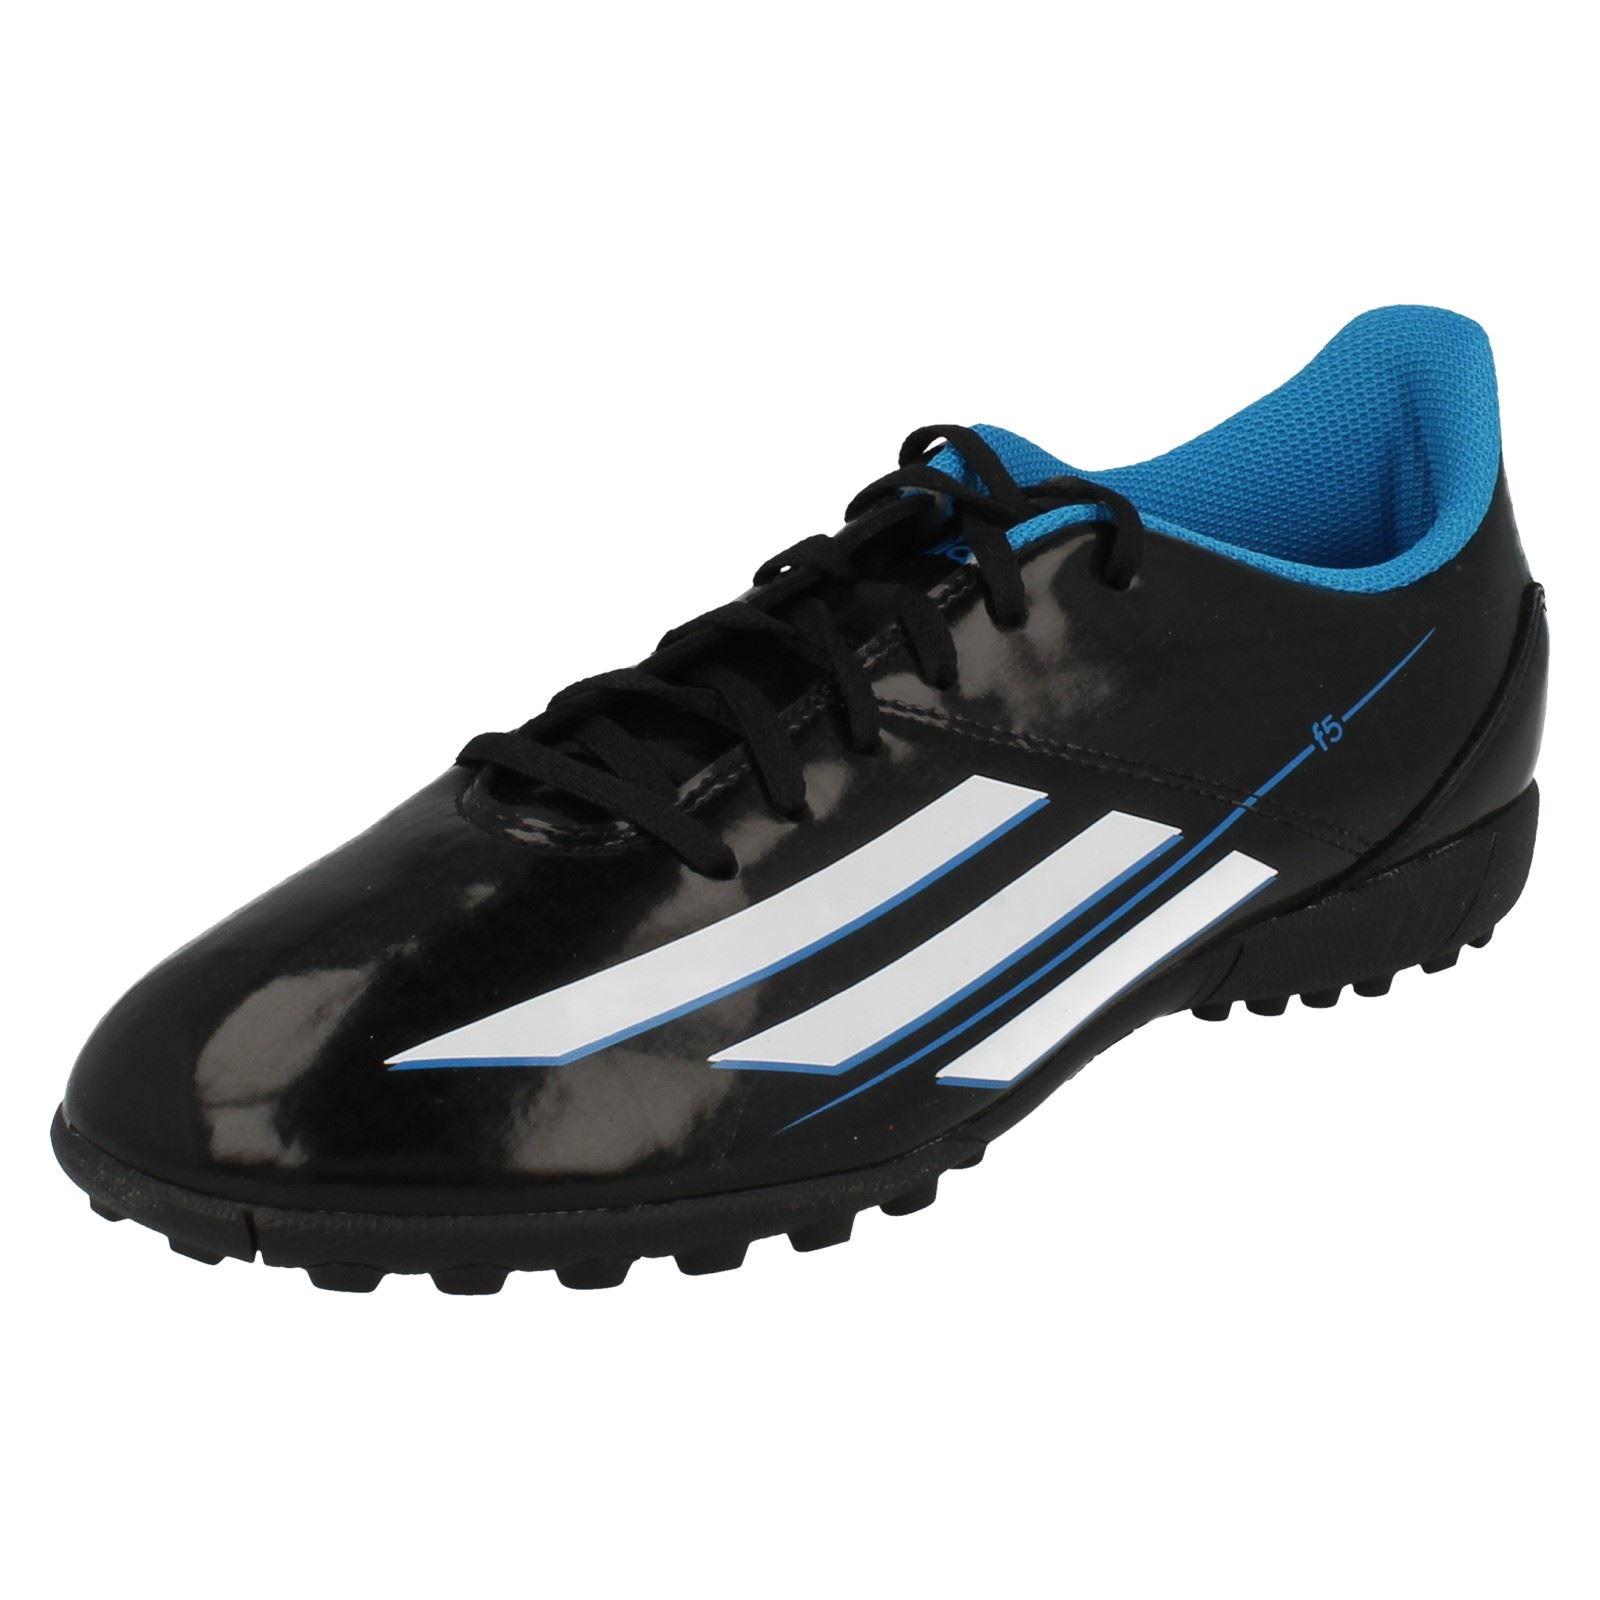 Details about ADIDAS FOOTBALL BOOTS BRACARA III SOCCER CLEATS KIDS SIZE 5 TRX FJ